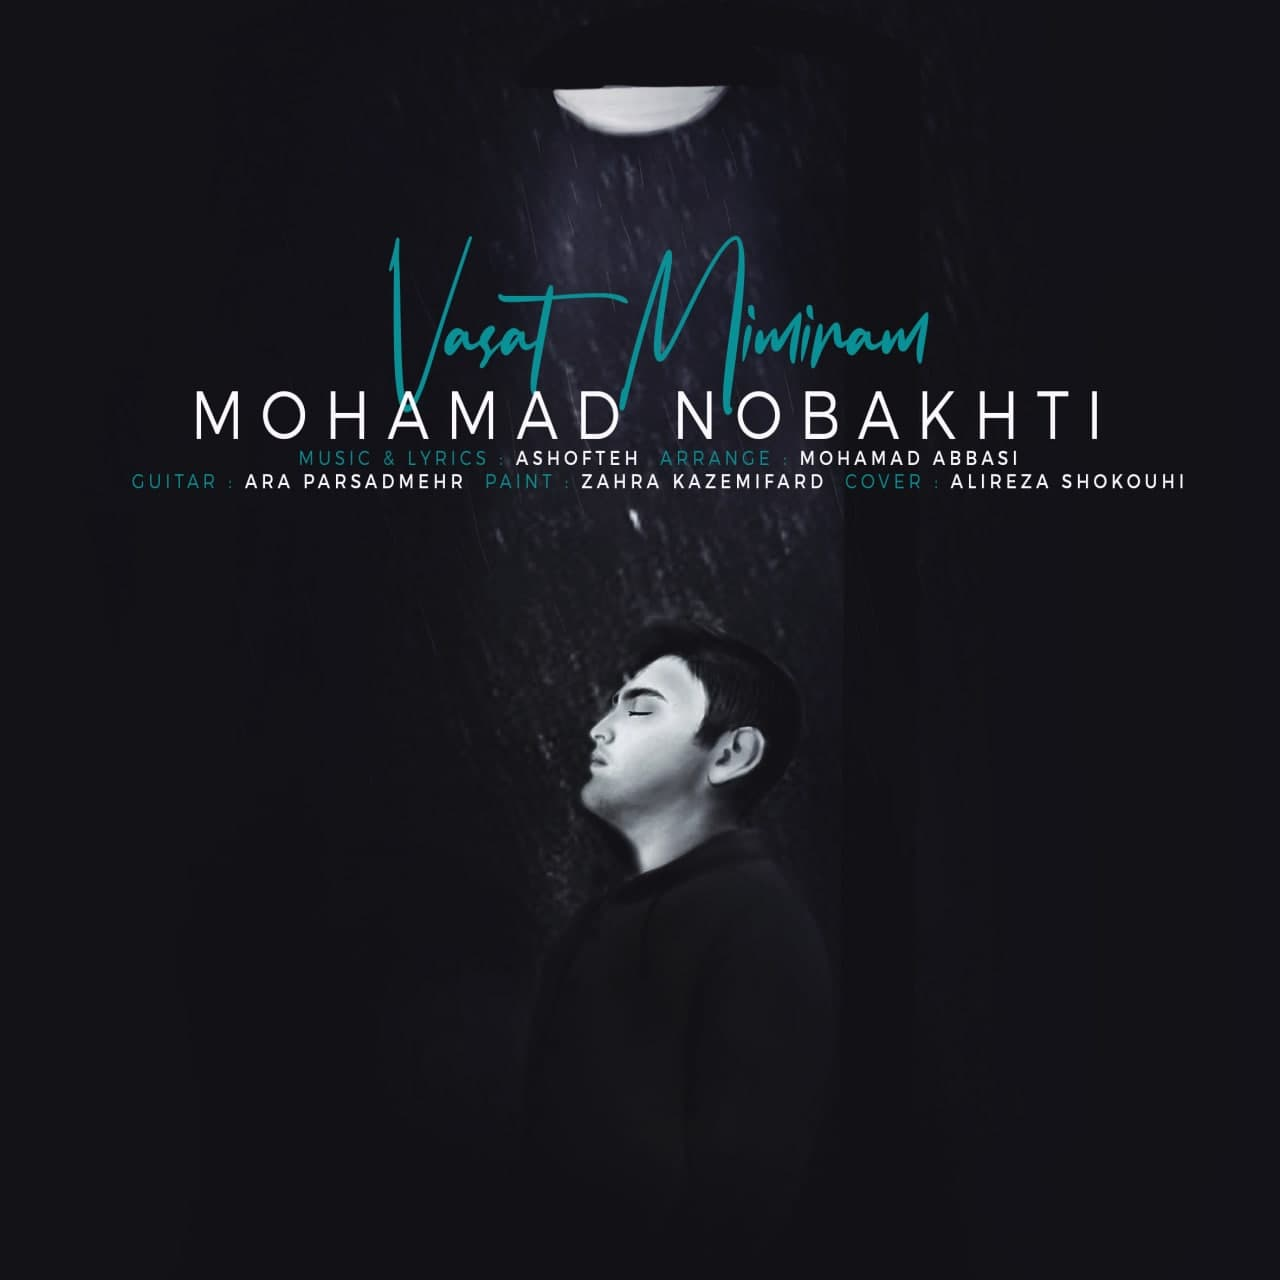 Download Ahang محمد نوبختی واست میمیرم